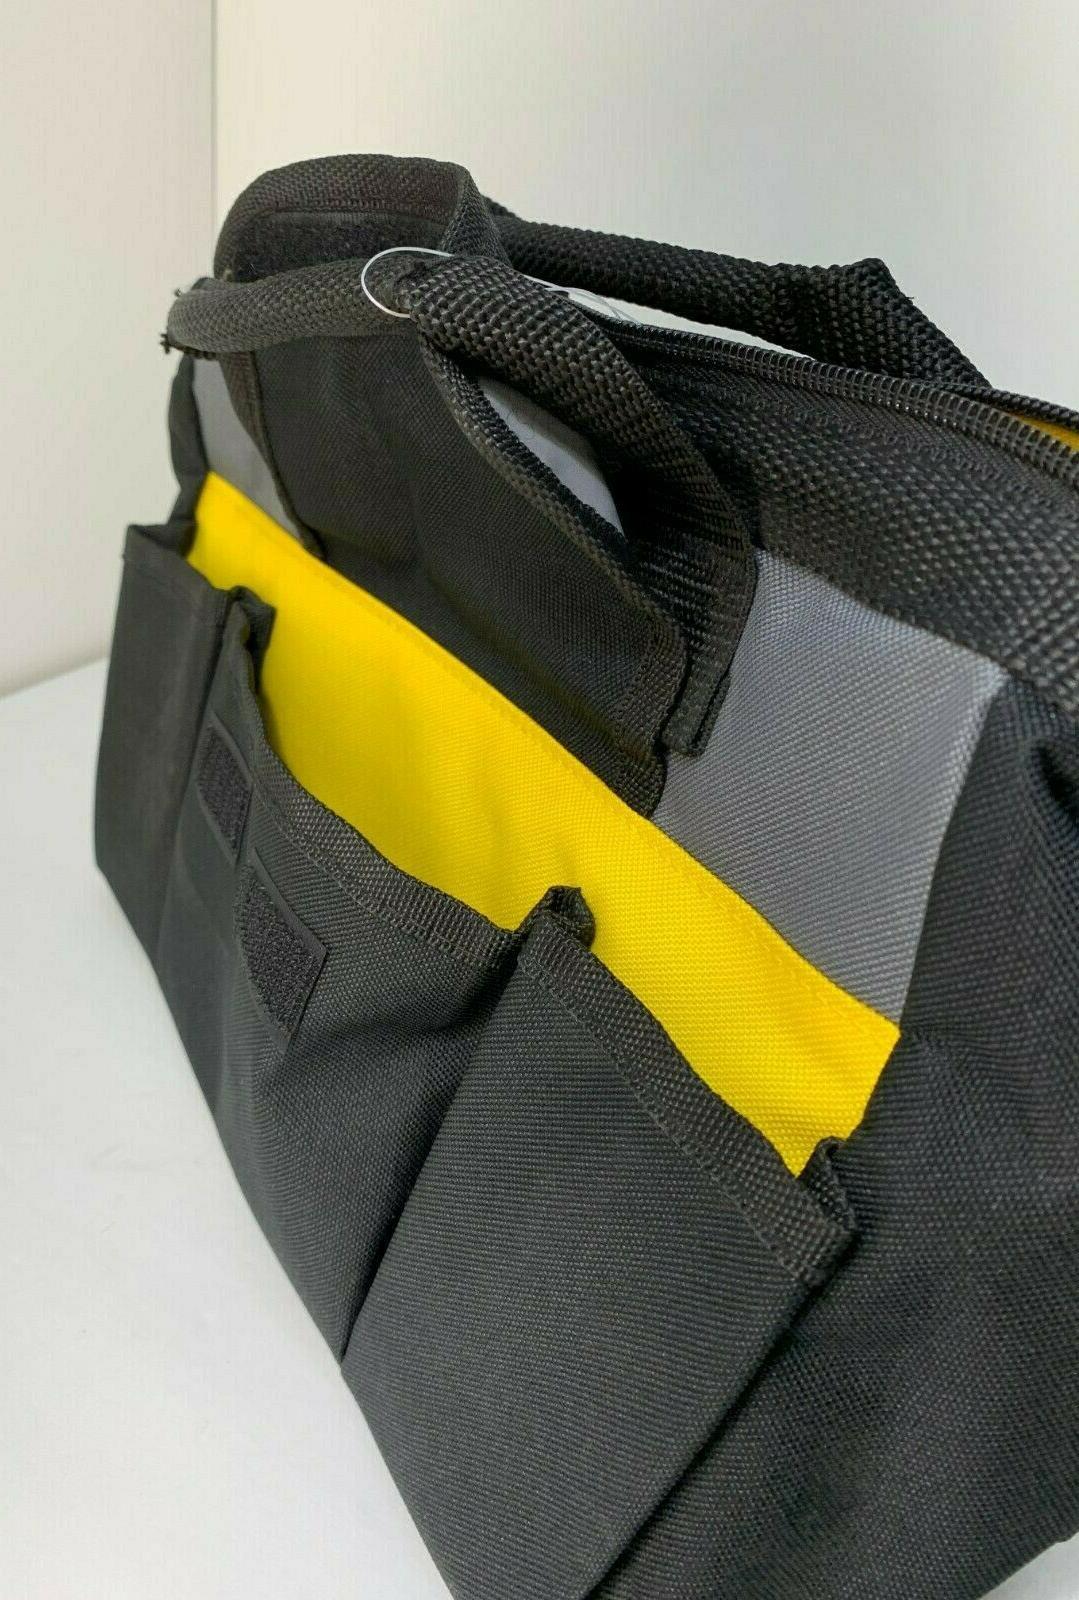 STANLEY BAG │STST70574 Soft 7 -New